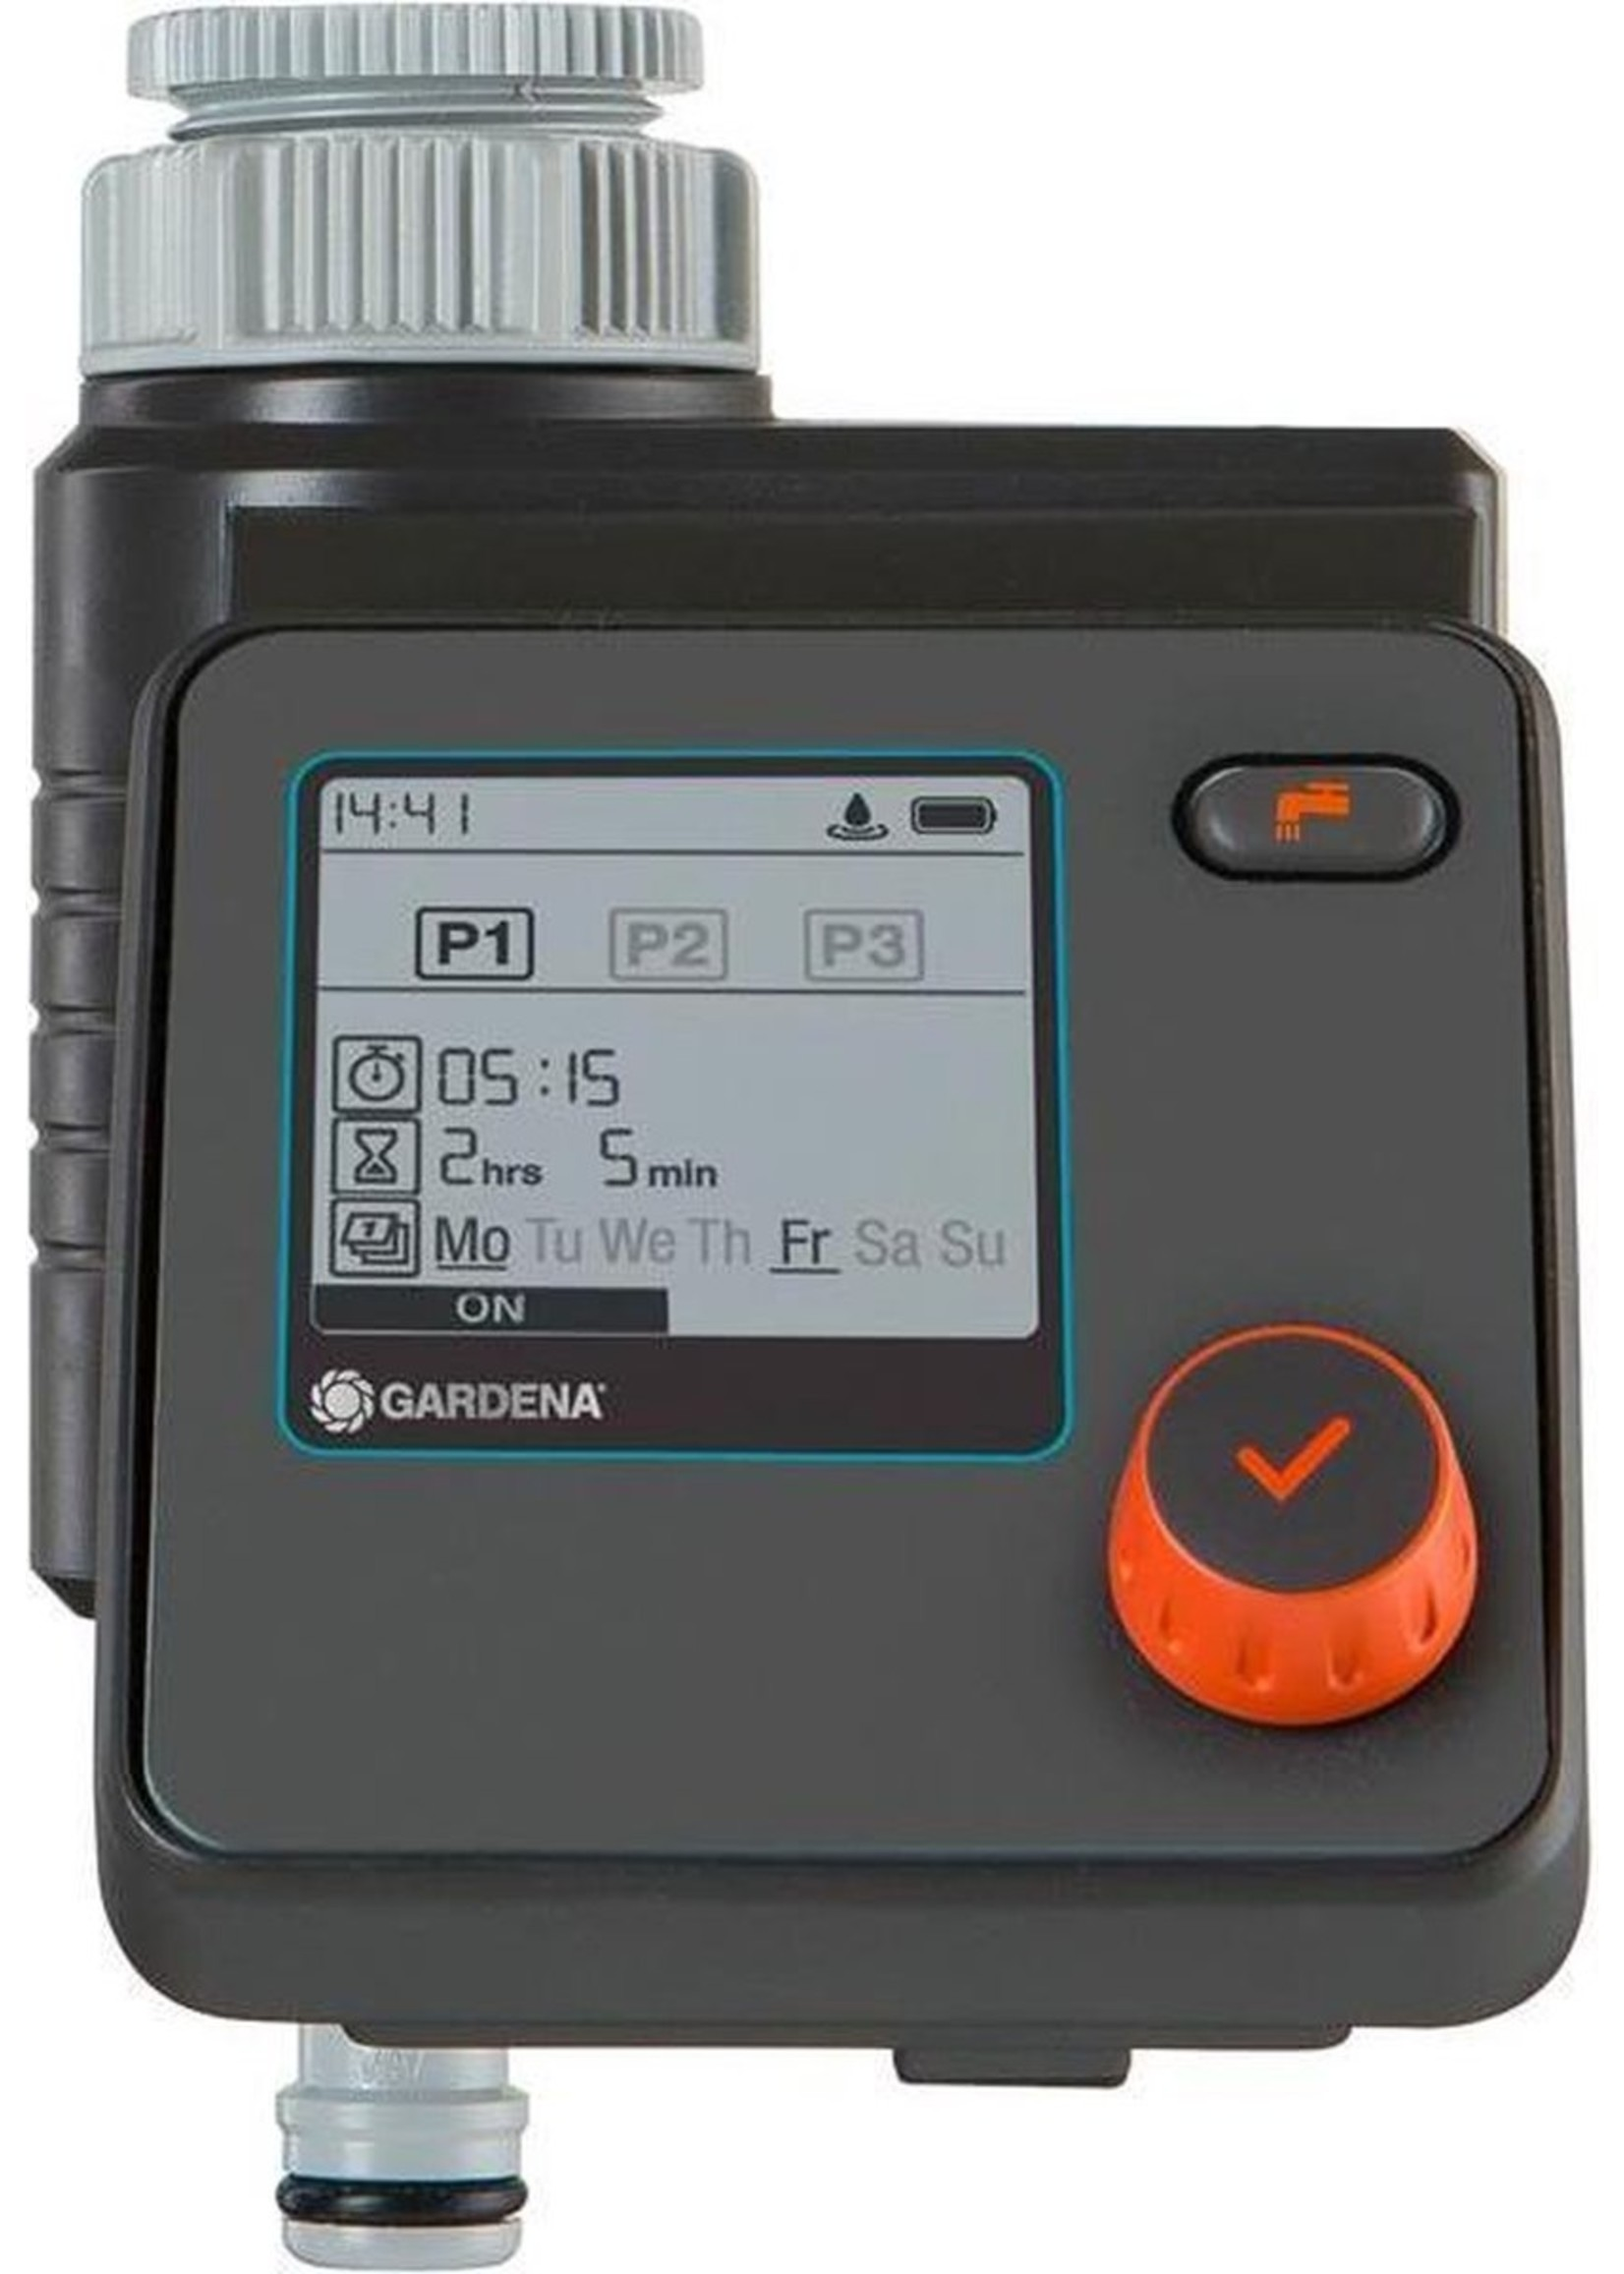 Gardena Gardena - Besproeiingscomputer Select Control